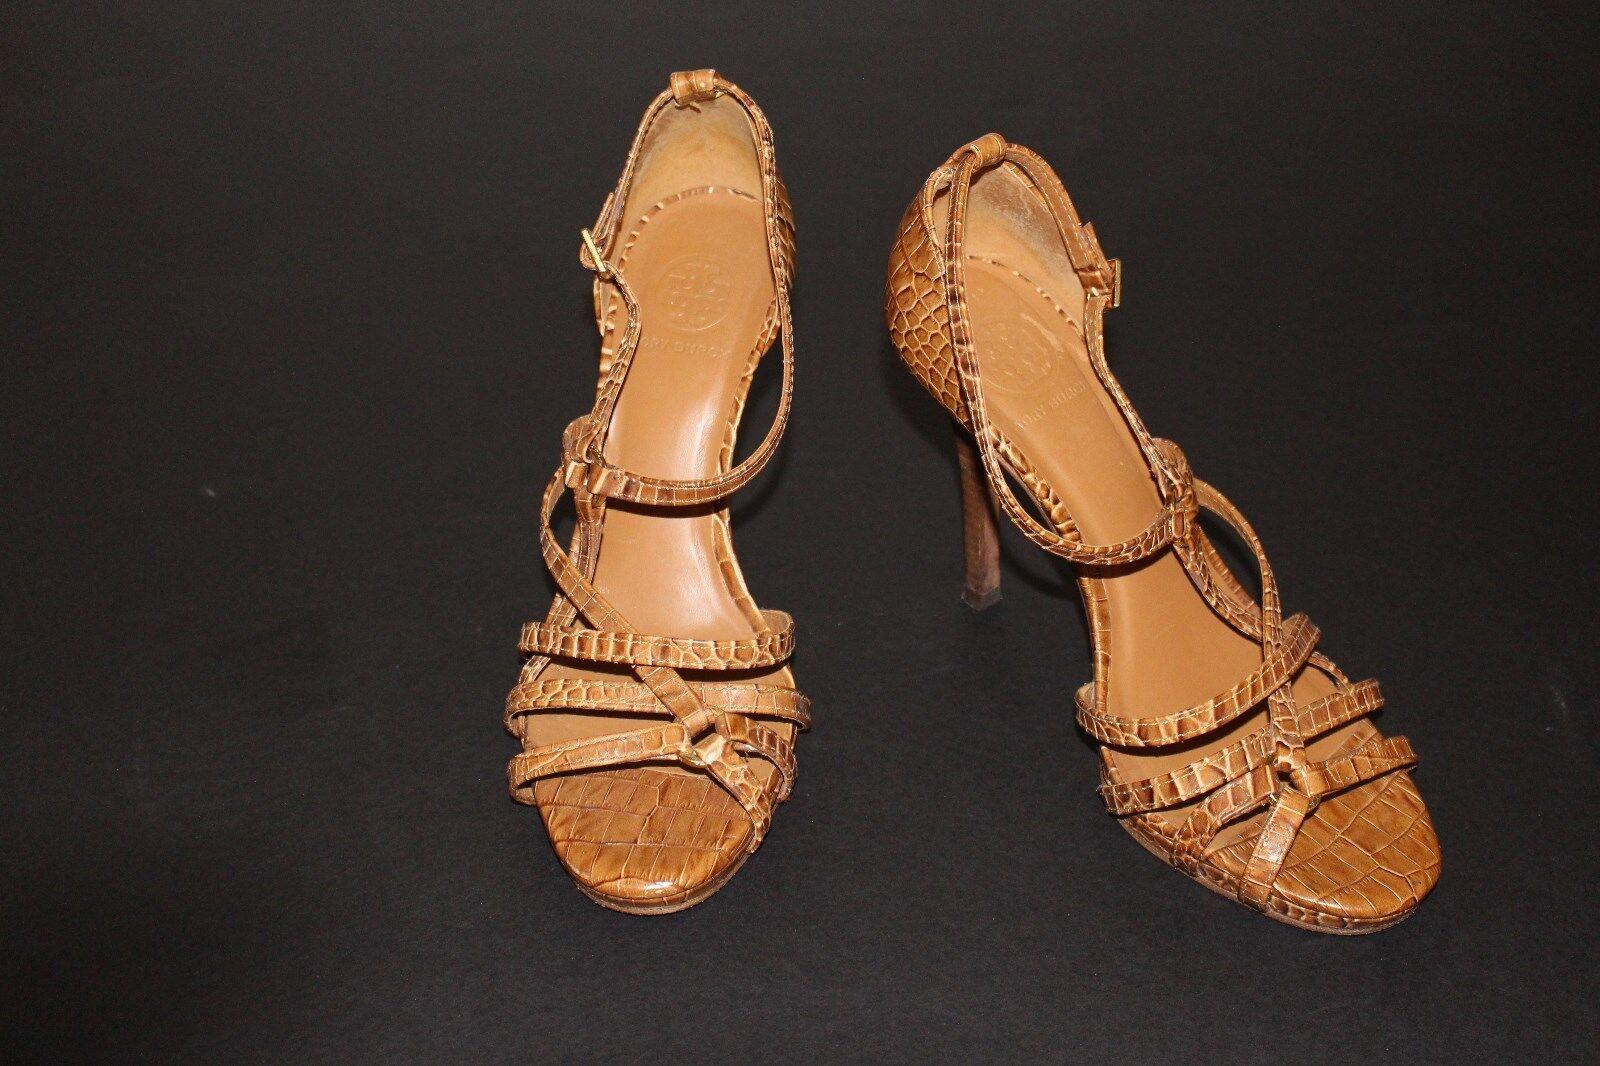 Tory Burch 9 M Tan Croc Embossed Leder Sandale 4.25